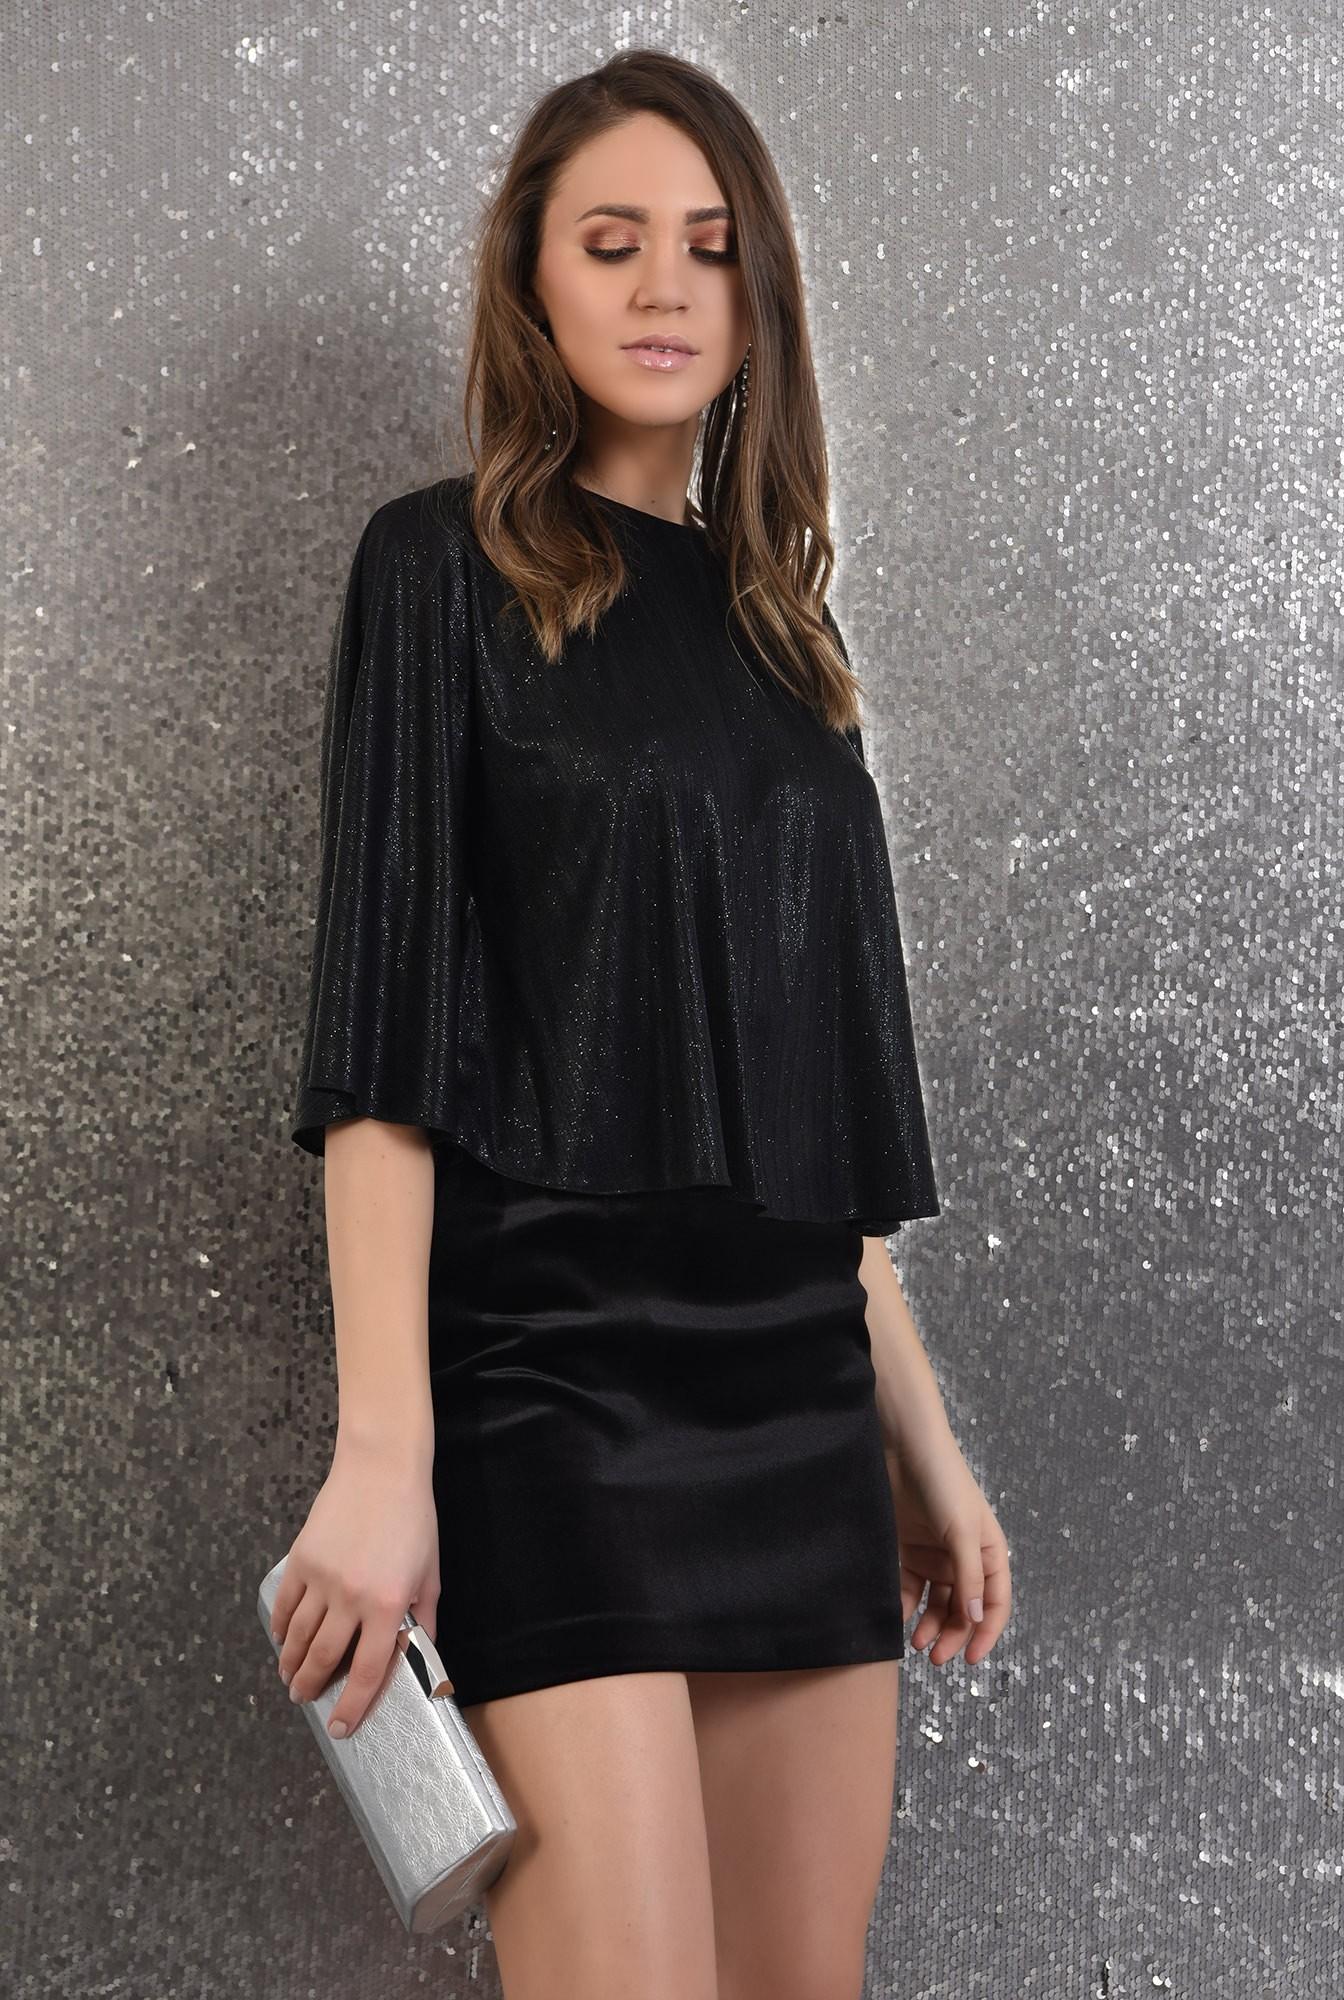 2 -  bluza cu sclipici, eleganta, de seara, neagra, croi evazat larg